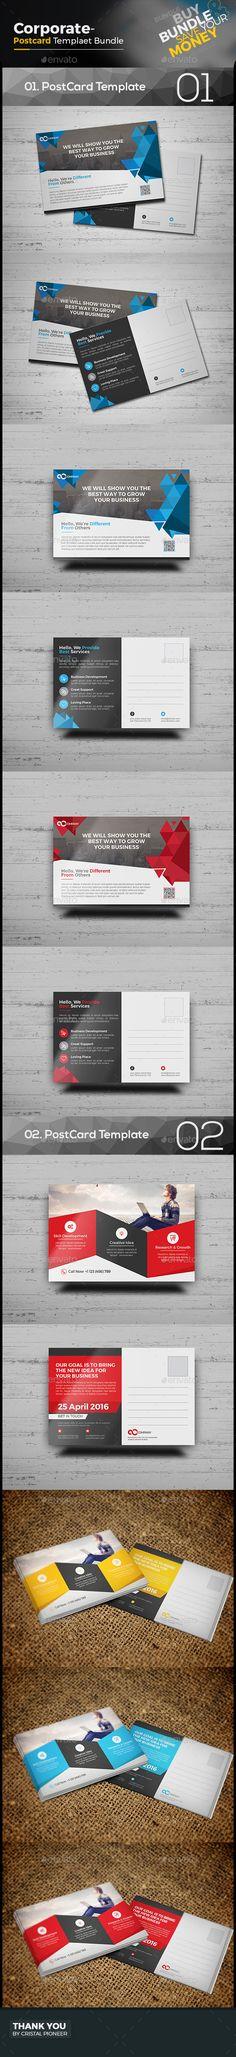 Postcard Template Postcard template, Business postcards and Ai - postcard template